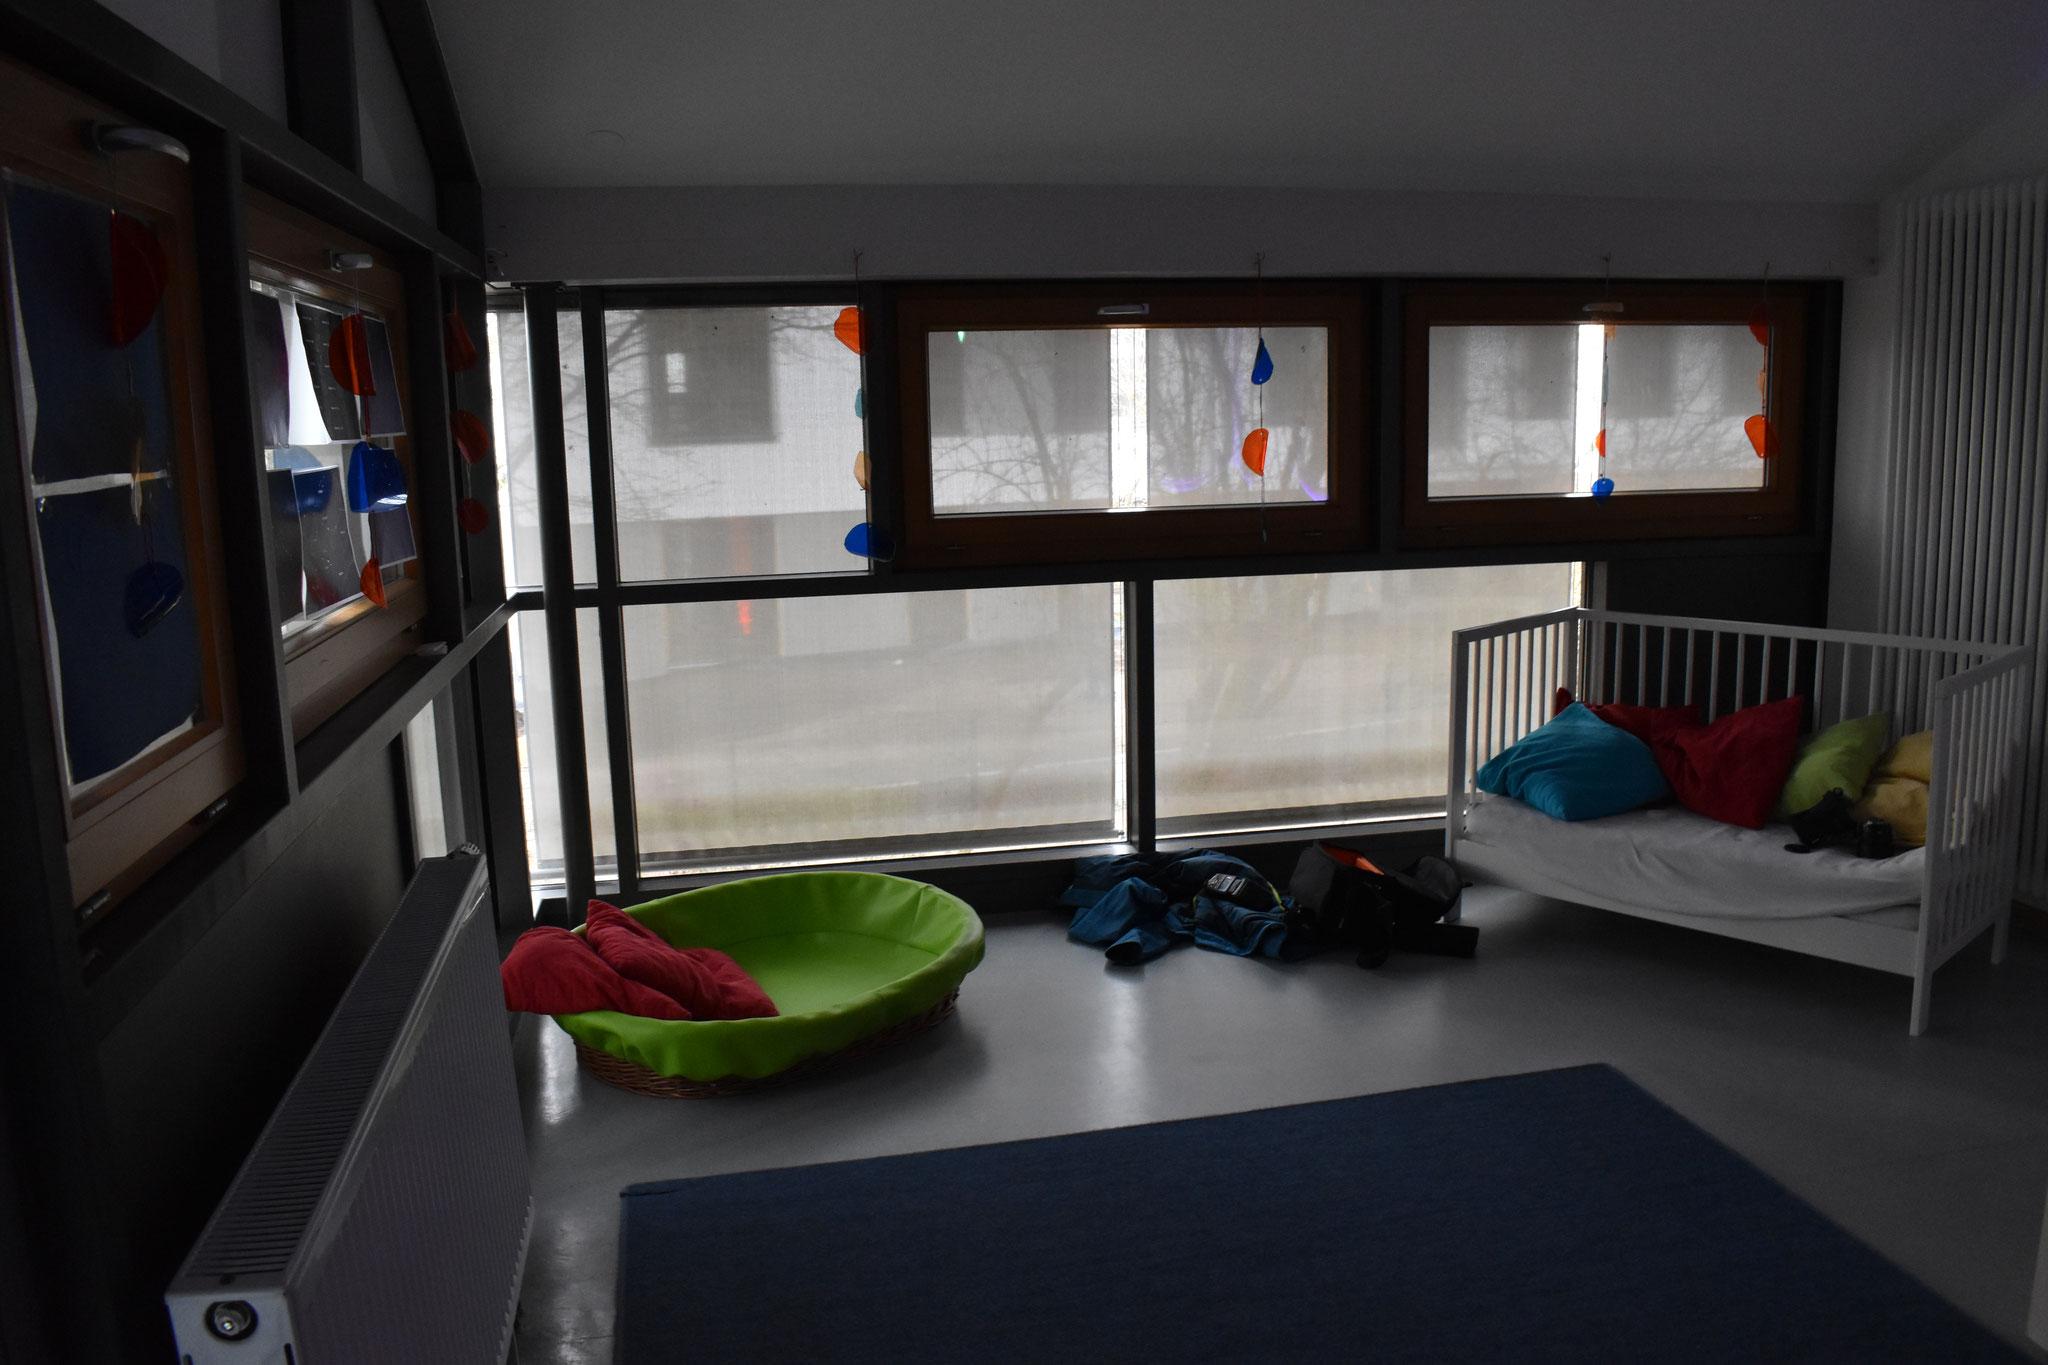 Förderverein KiTa Heuergrund e.V. - Kindertagesstätte Heuergrund - Mainz